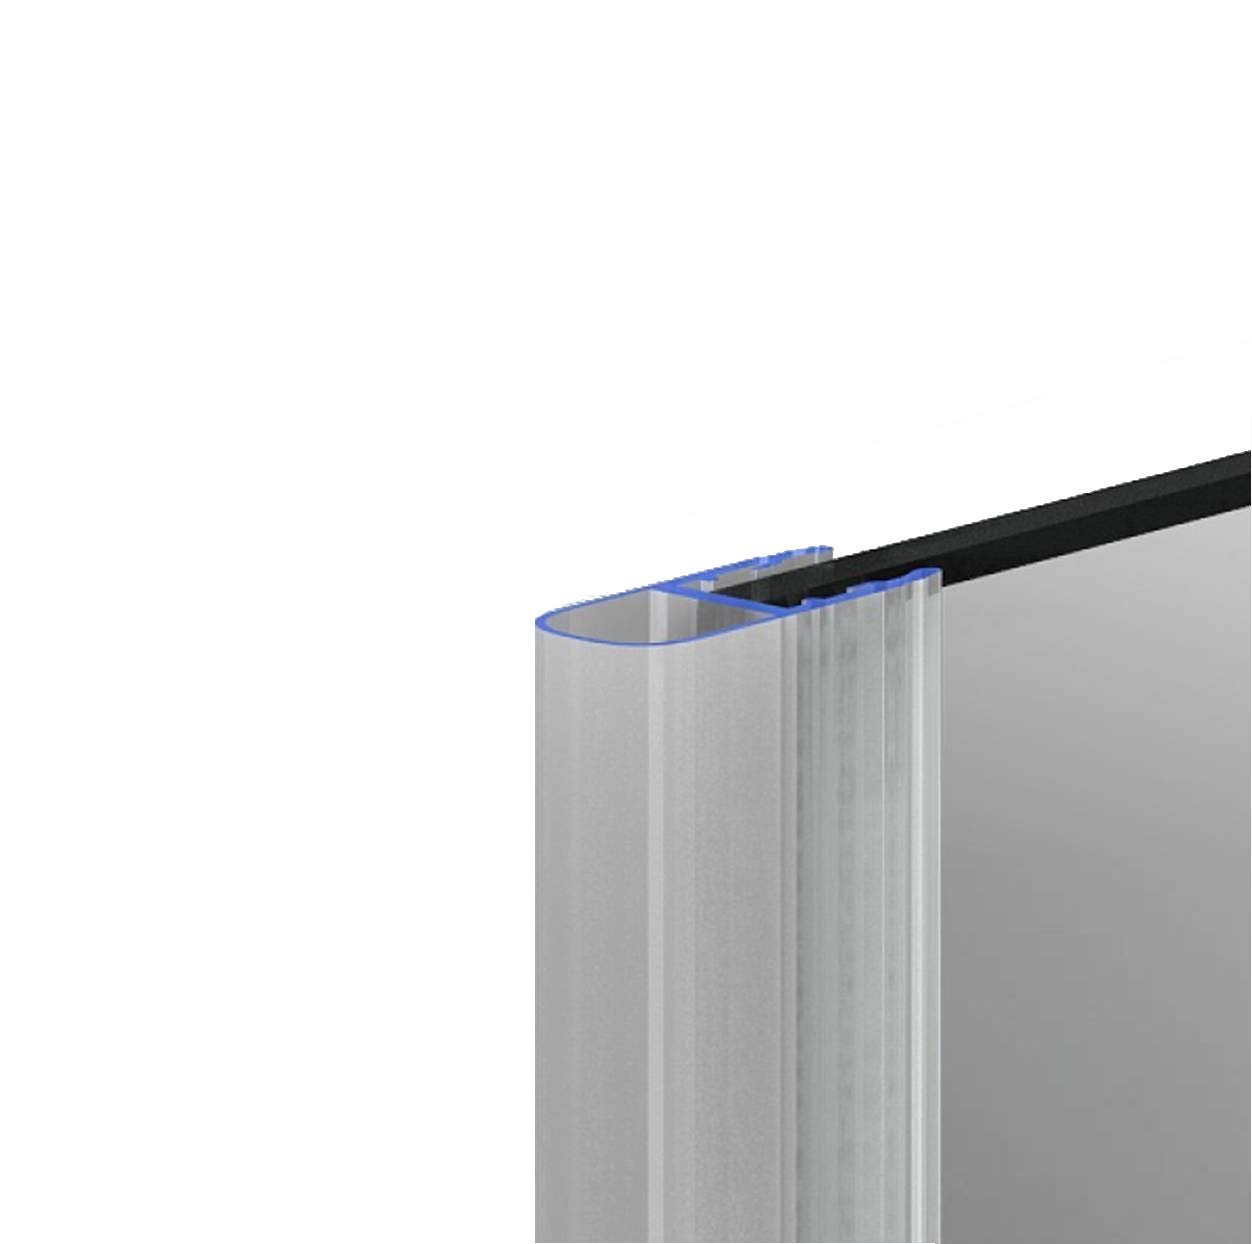 Duschdichtung Dichtleiste Balgdichtung Modell 9 fü r 8mm Glasstä rke 200cm .one-bath